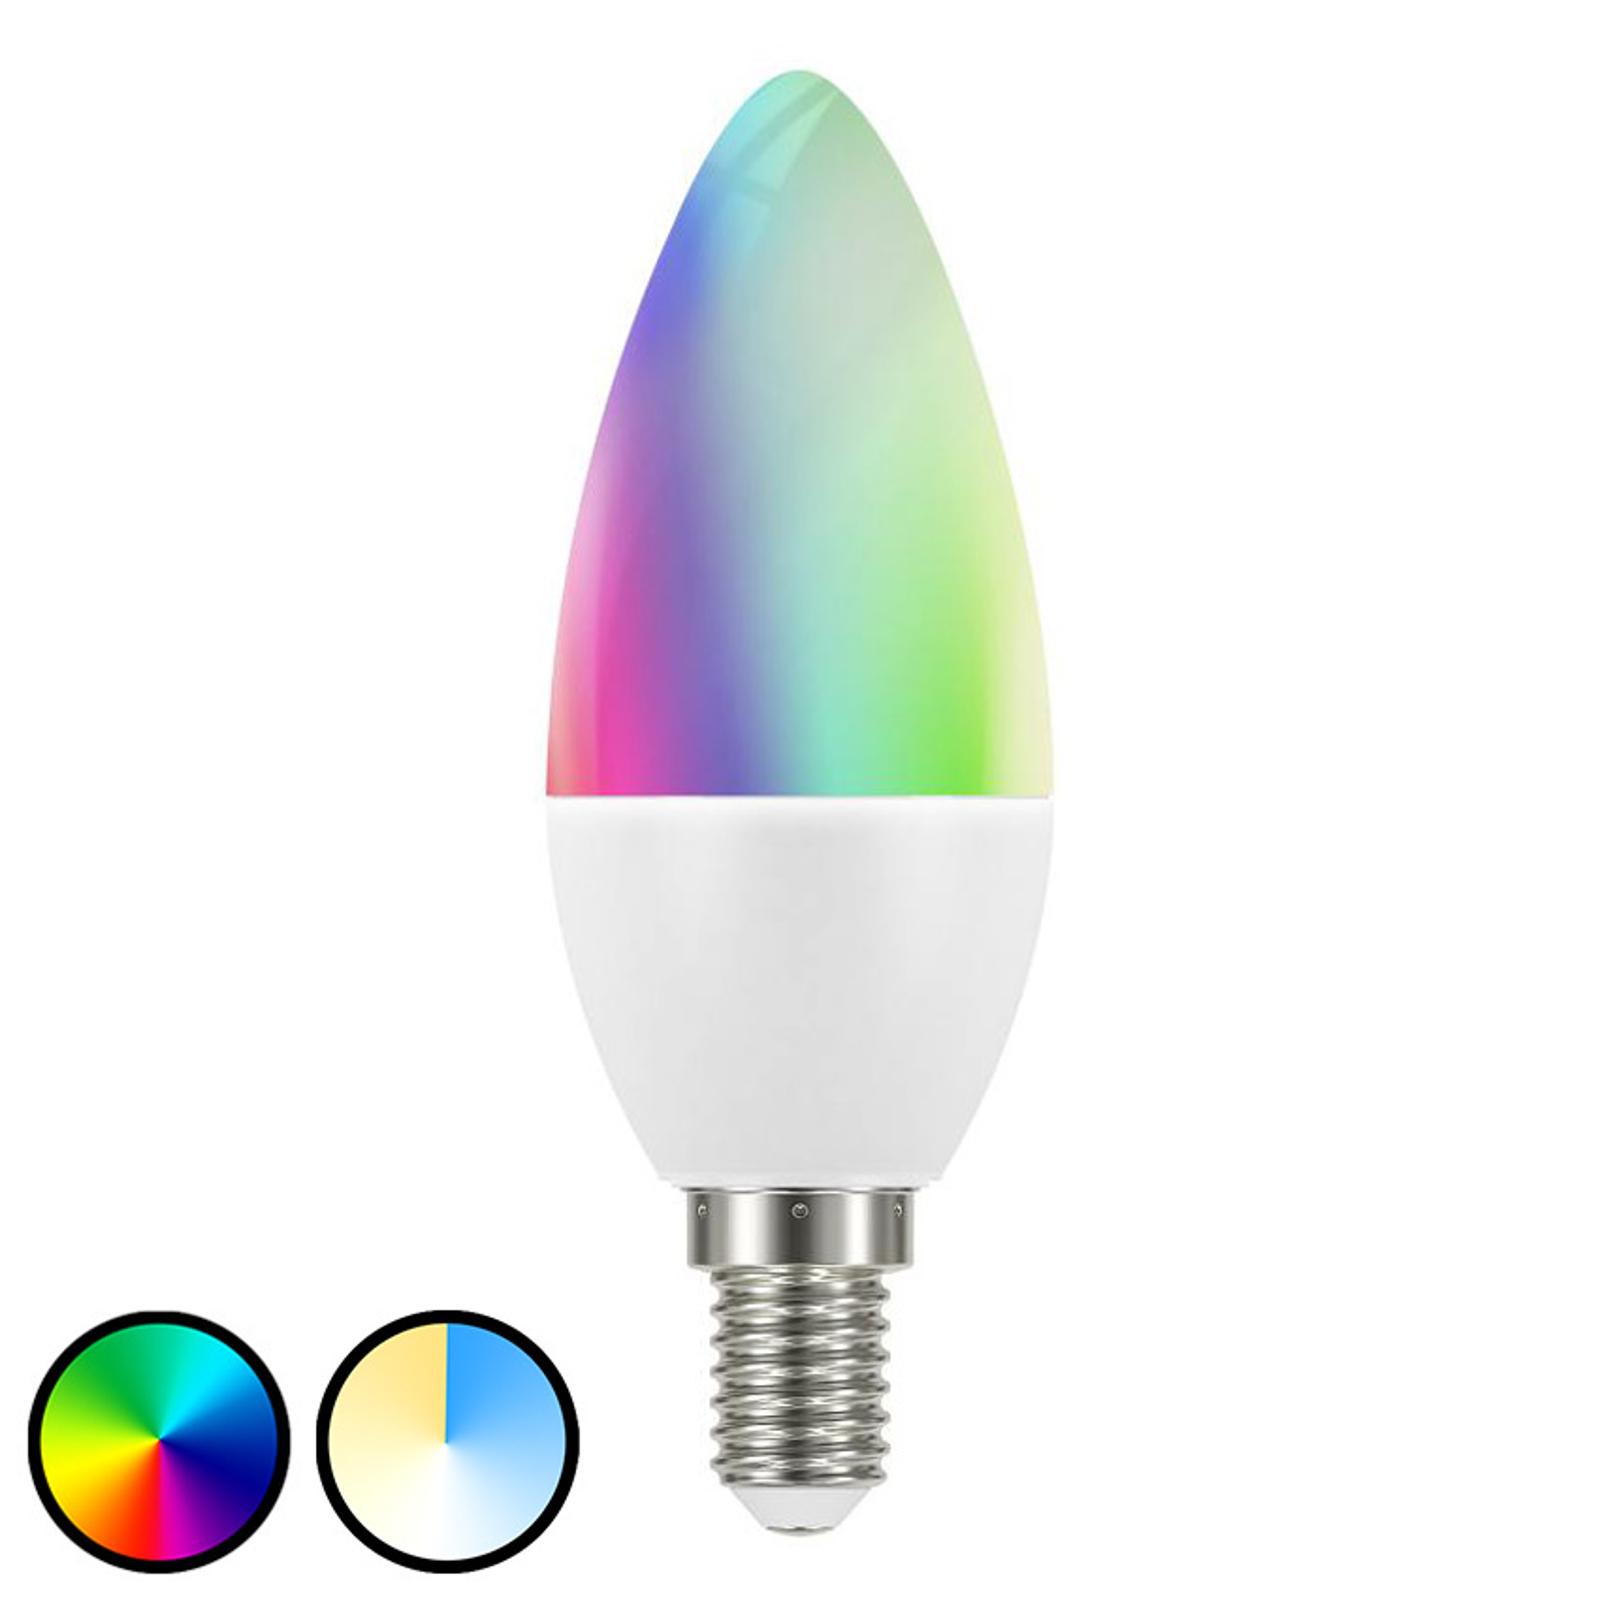 Müller Licht tint white+color -LED-lamppu E14 6W